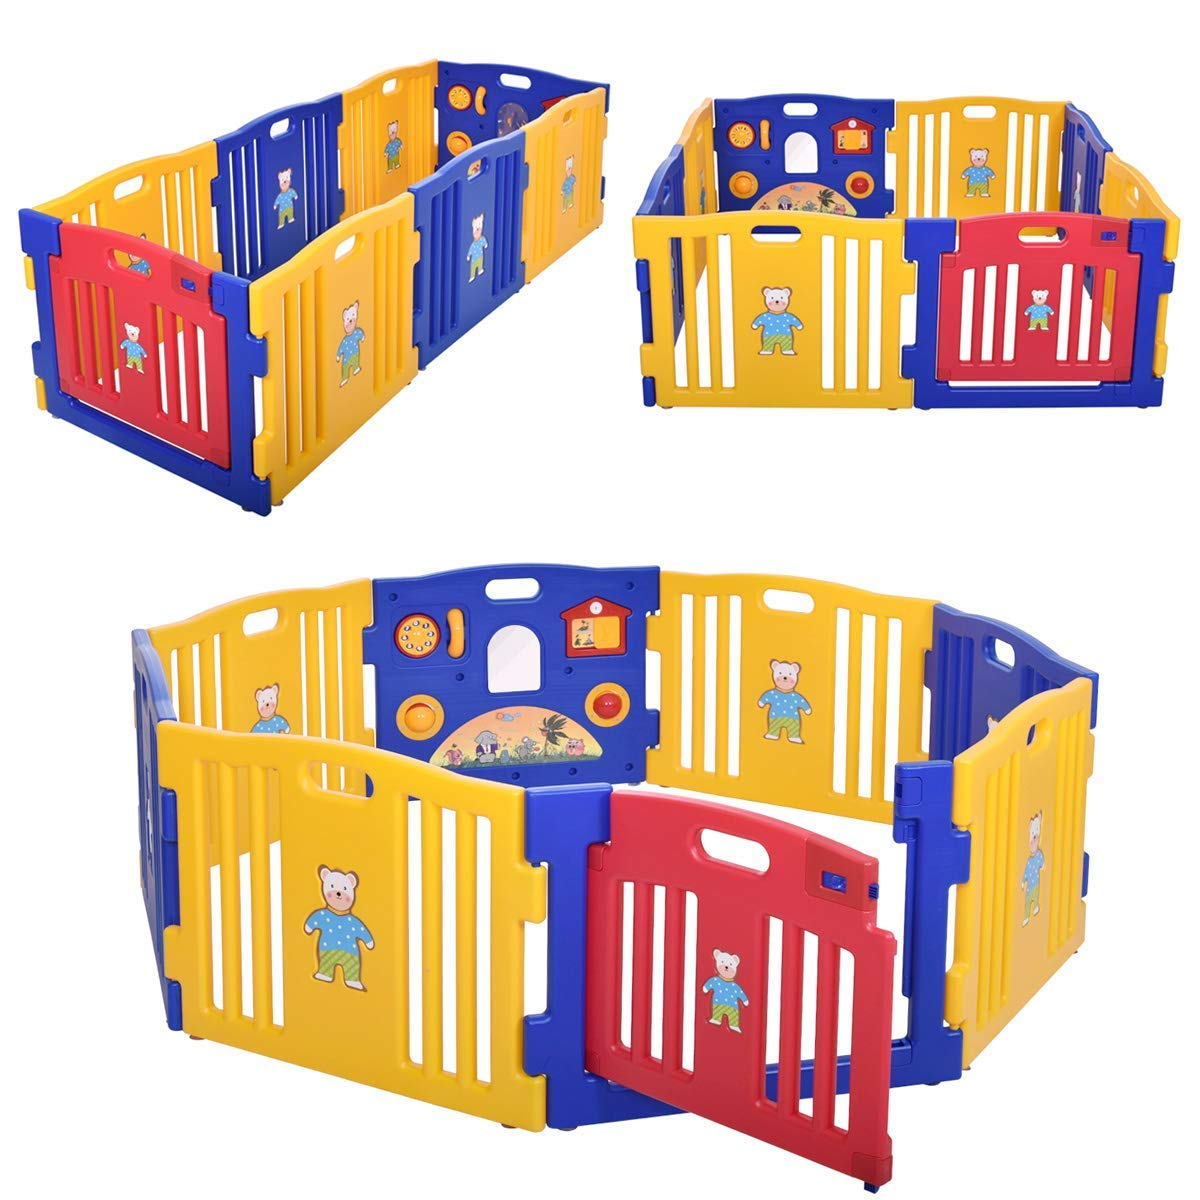 JAXPETY Baby Playpen Kids Best Safety Play Center Yard